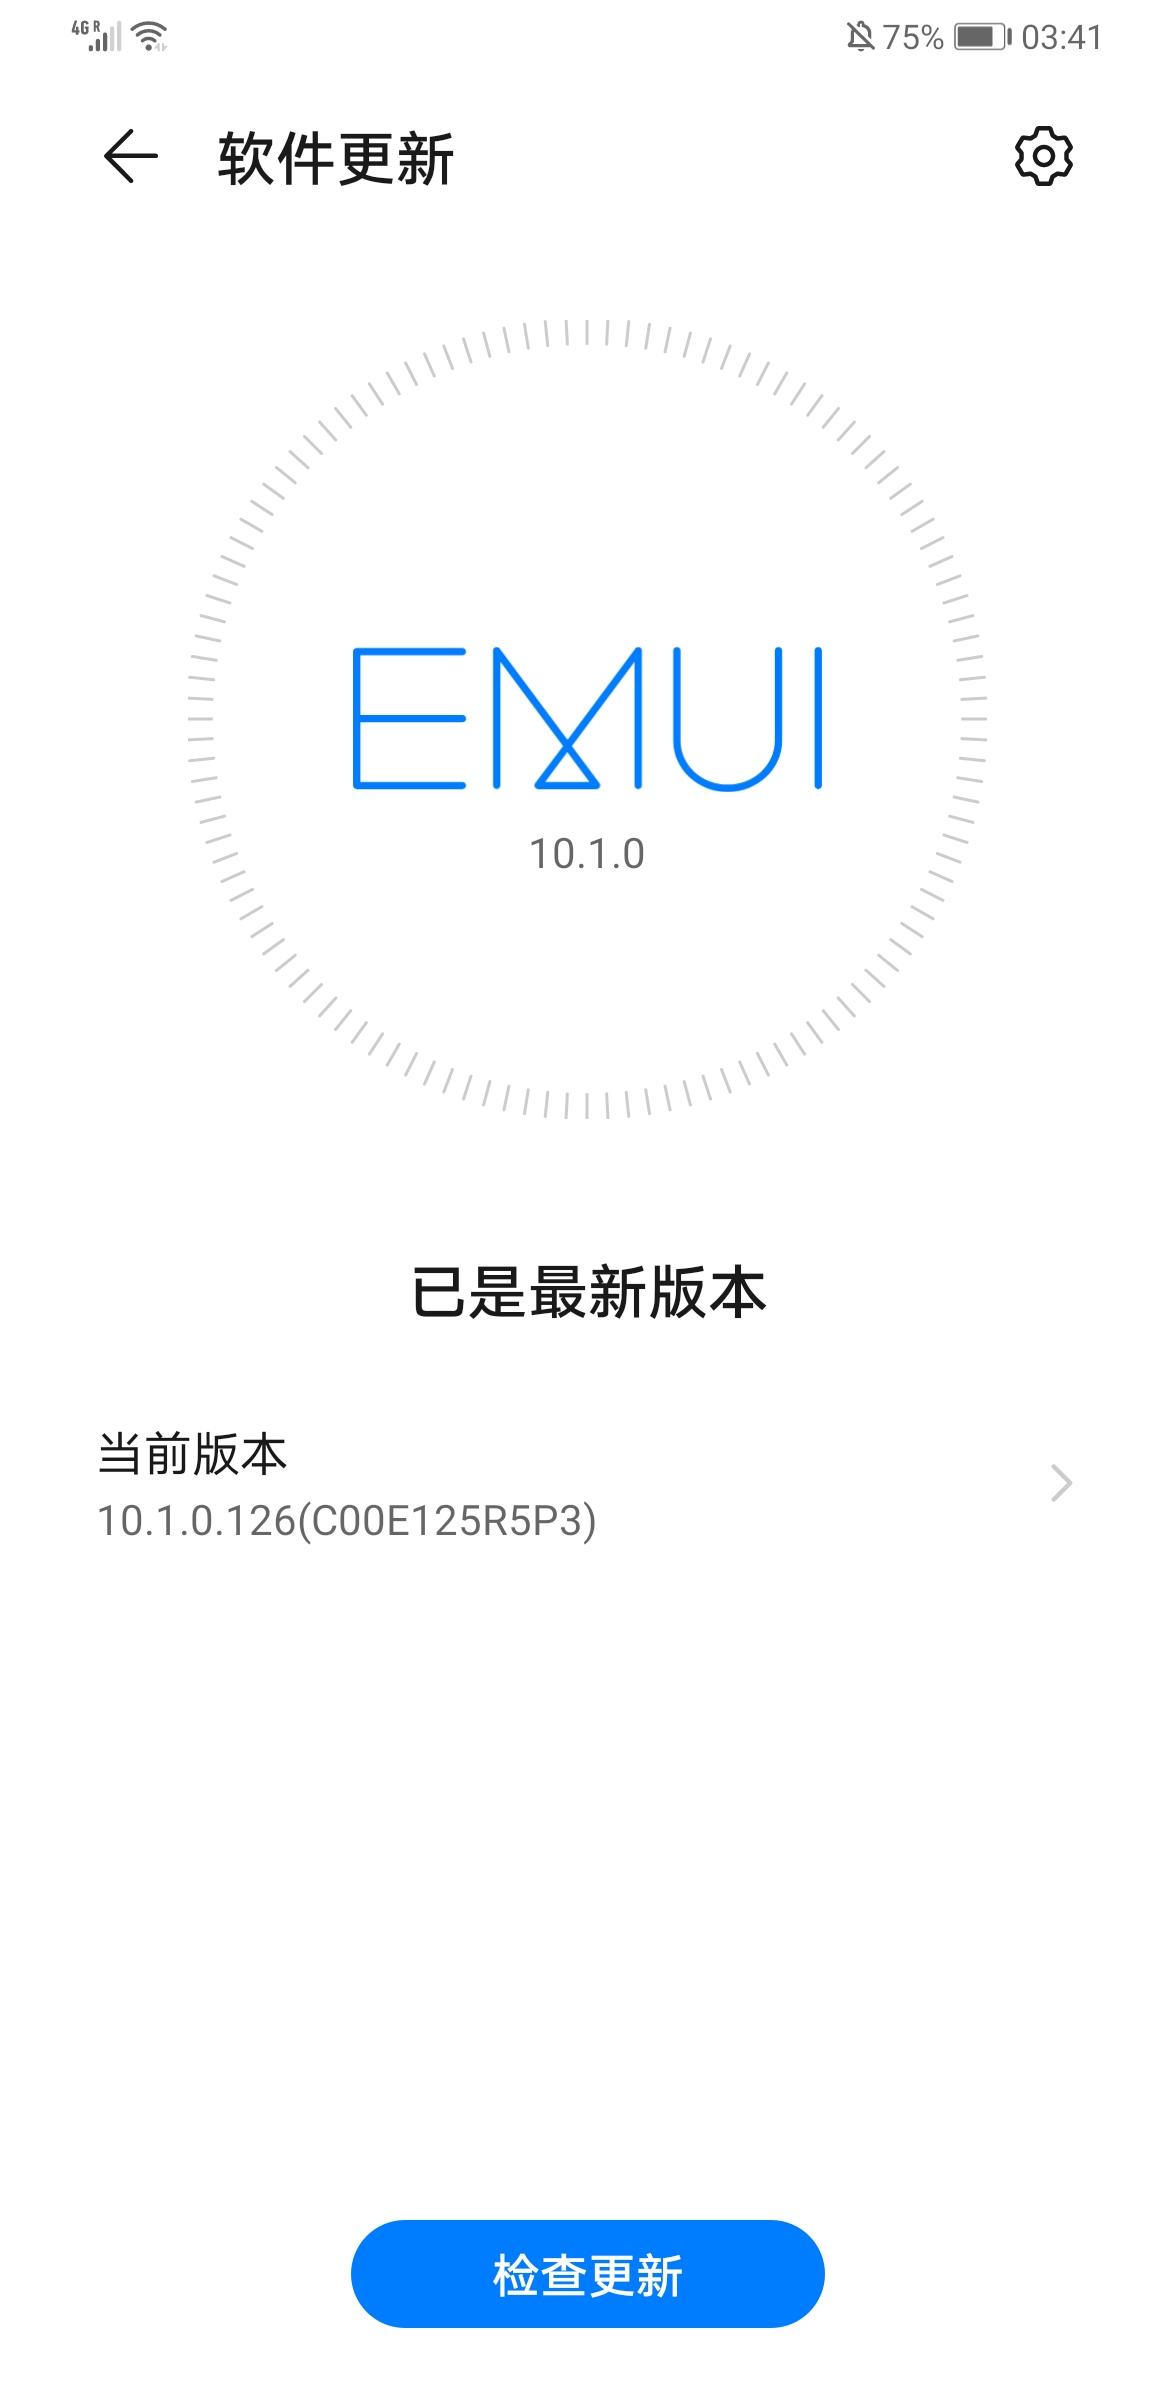 Screenshot_20200515_034136_com.huawei.android.hwouc.jpg